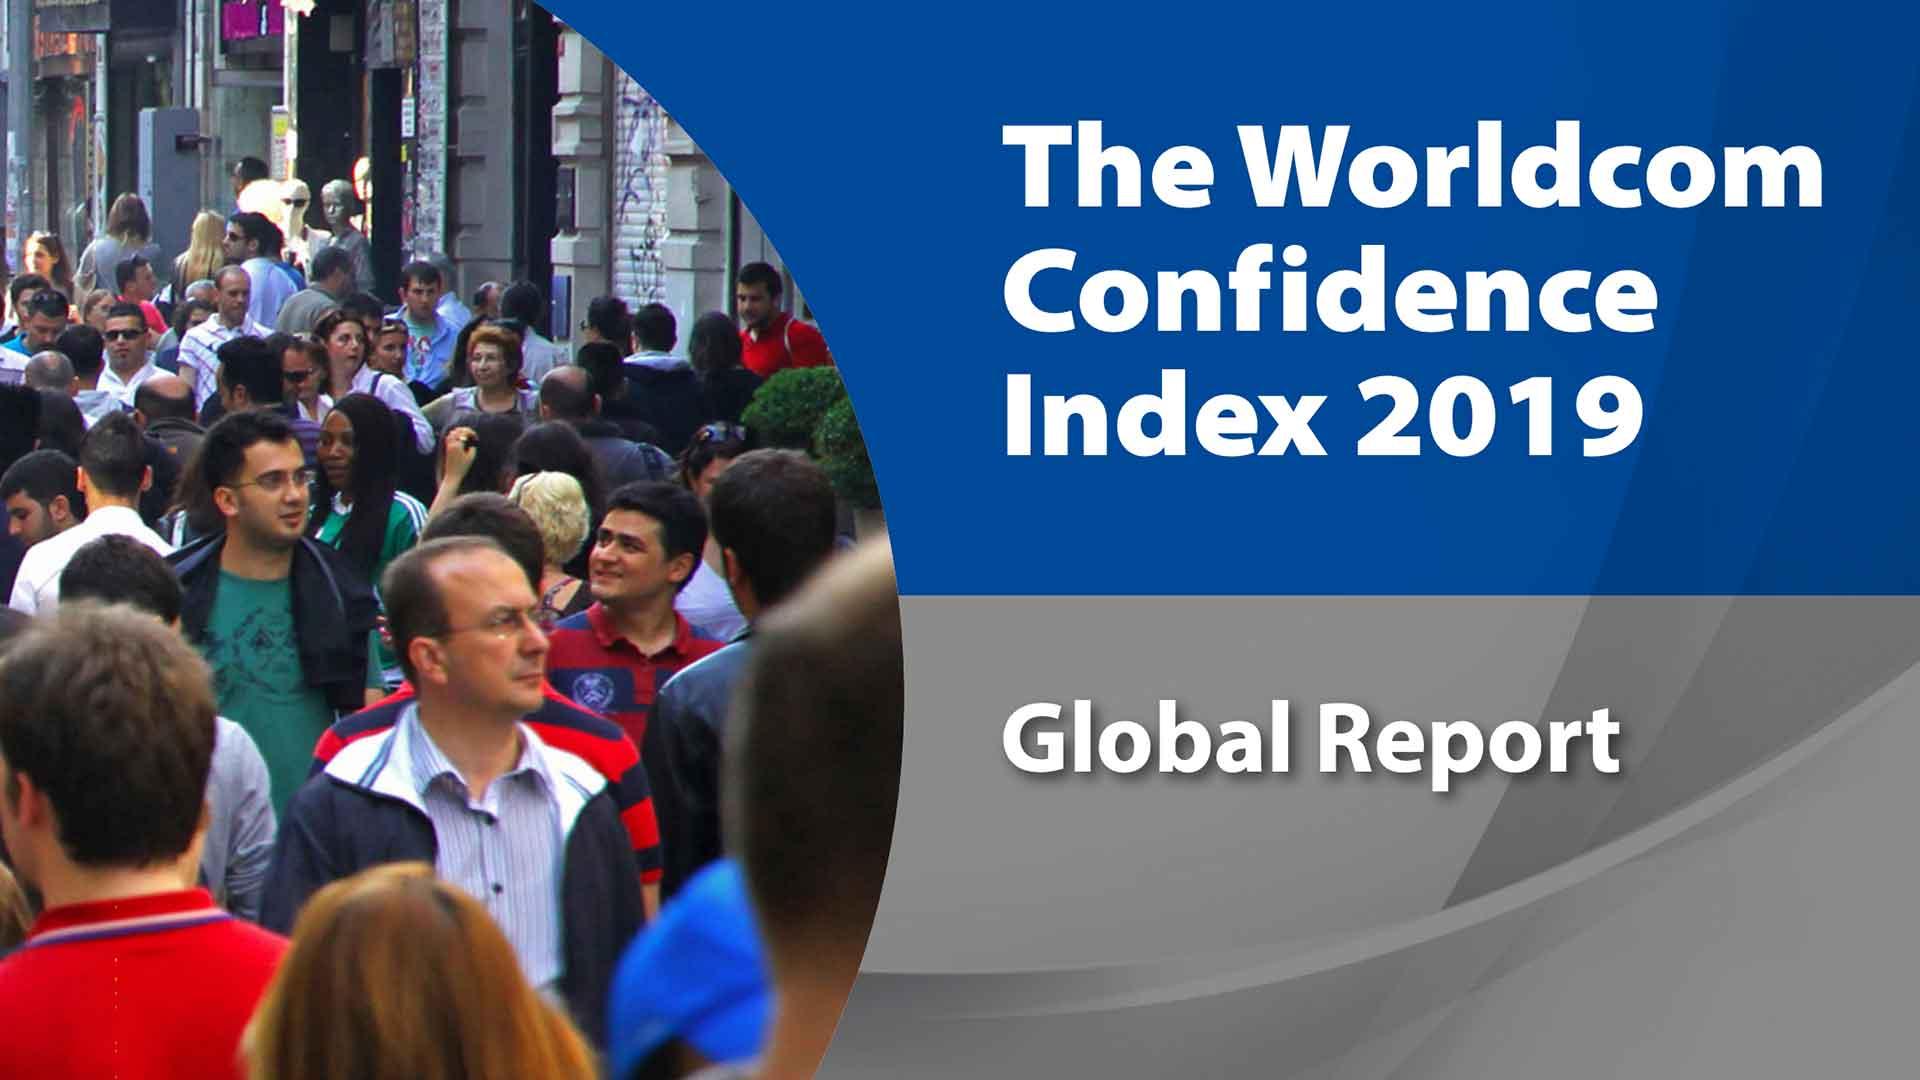 worldcom confidence Index 2019